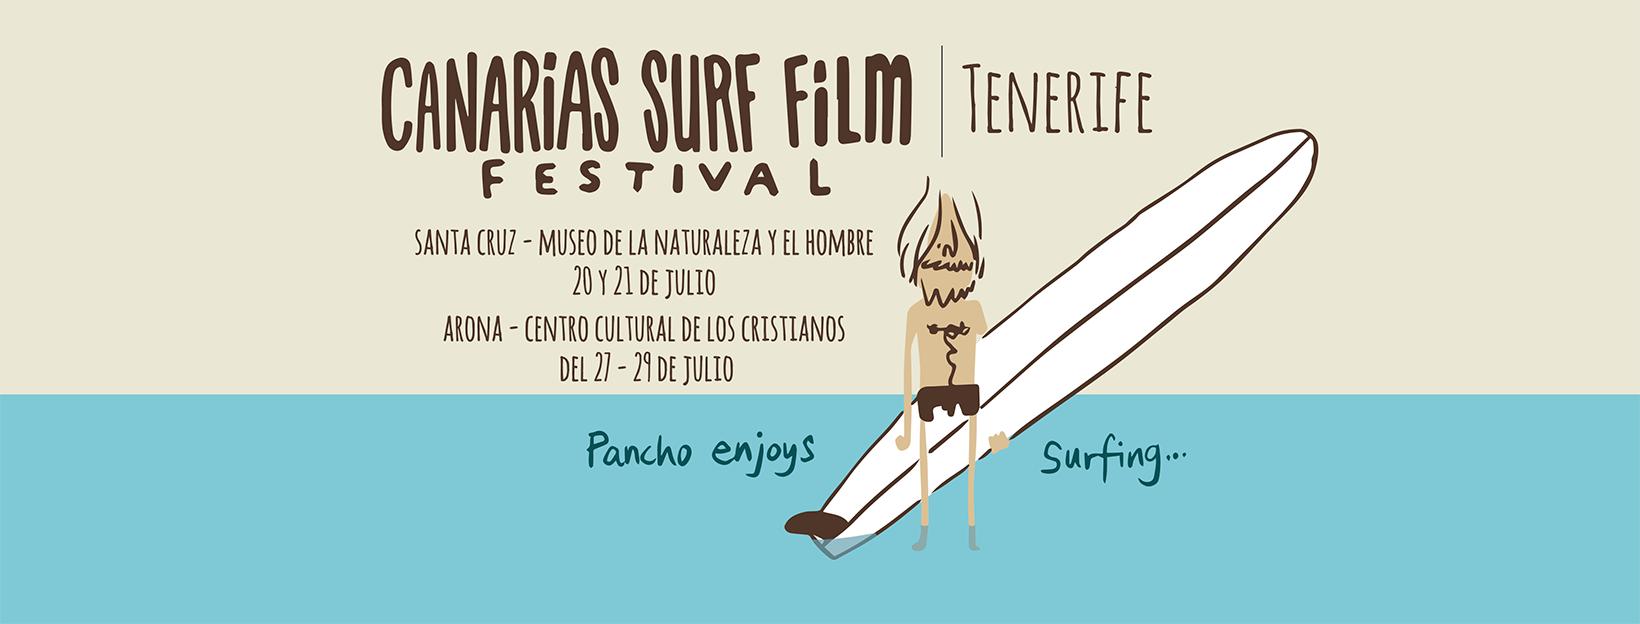 Canarias Surf Film Festival Tenerife